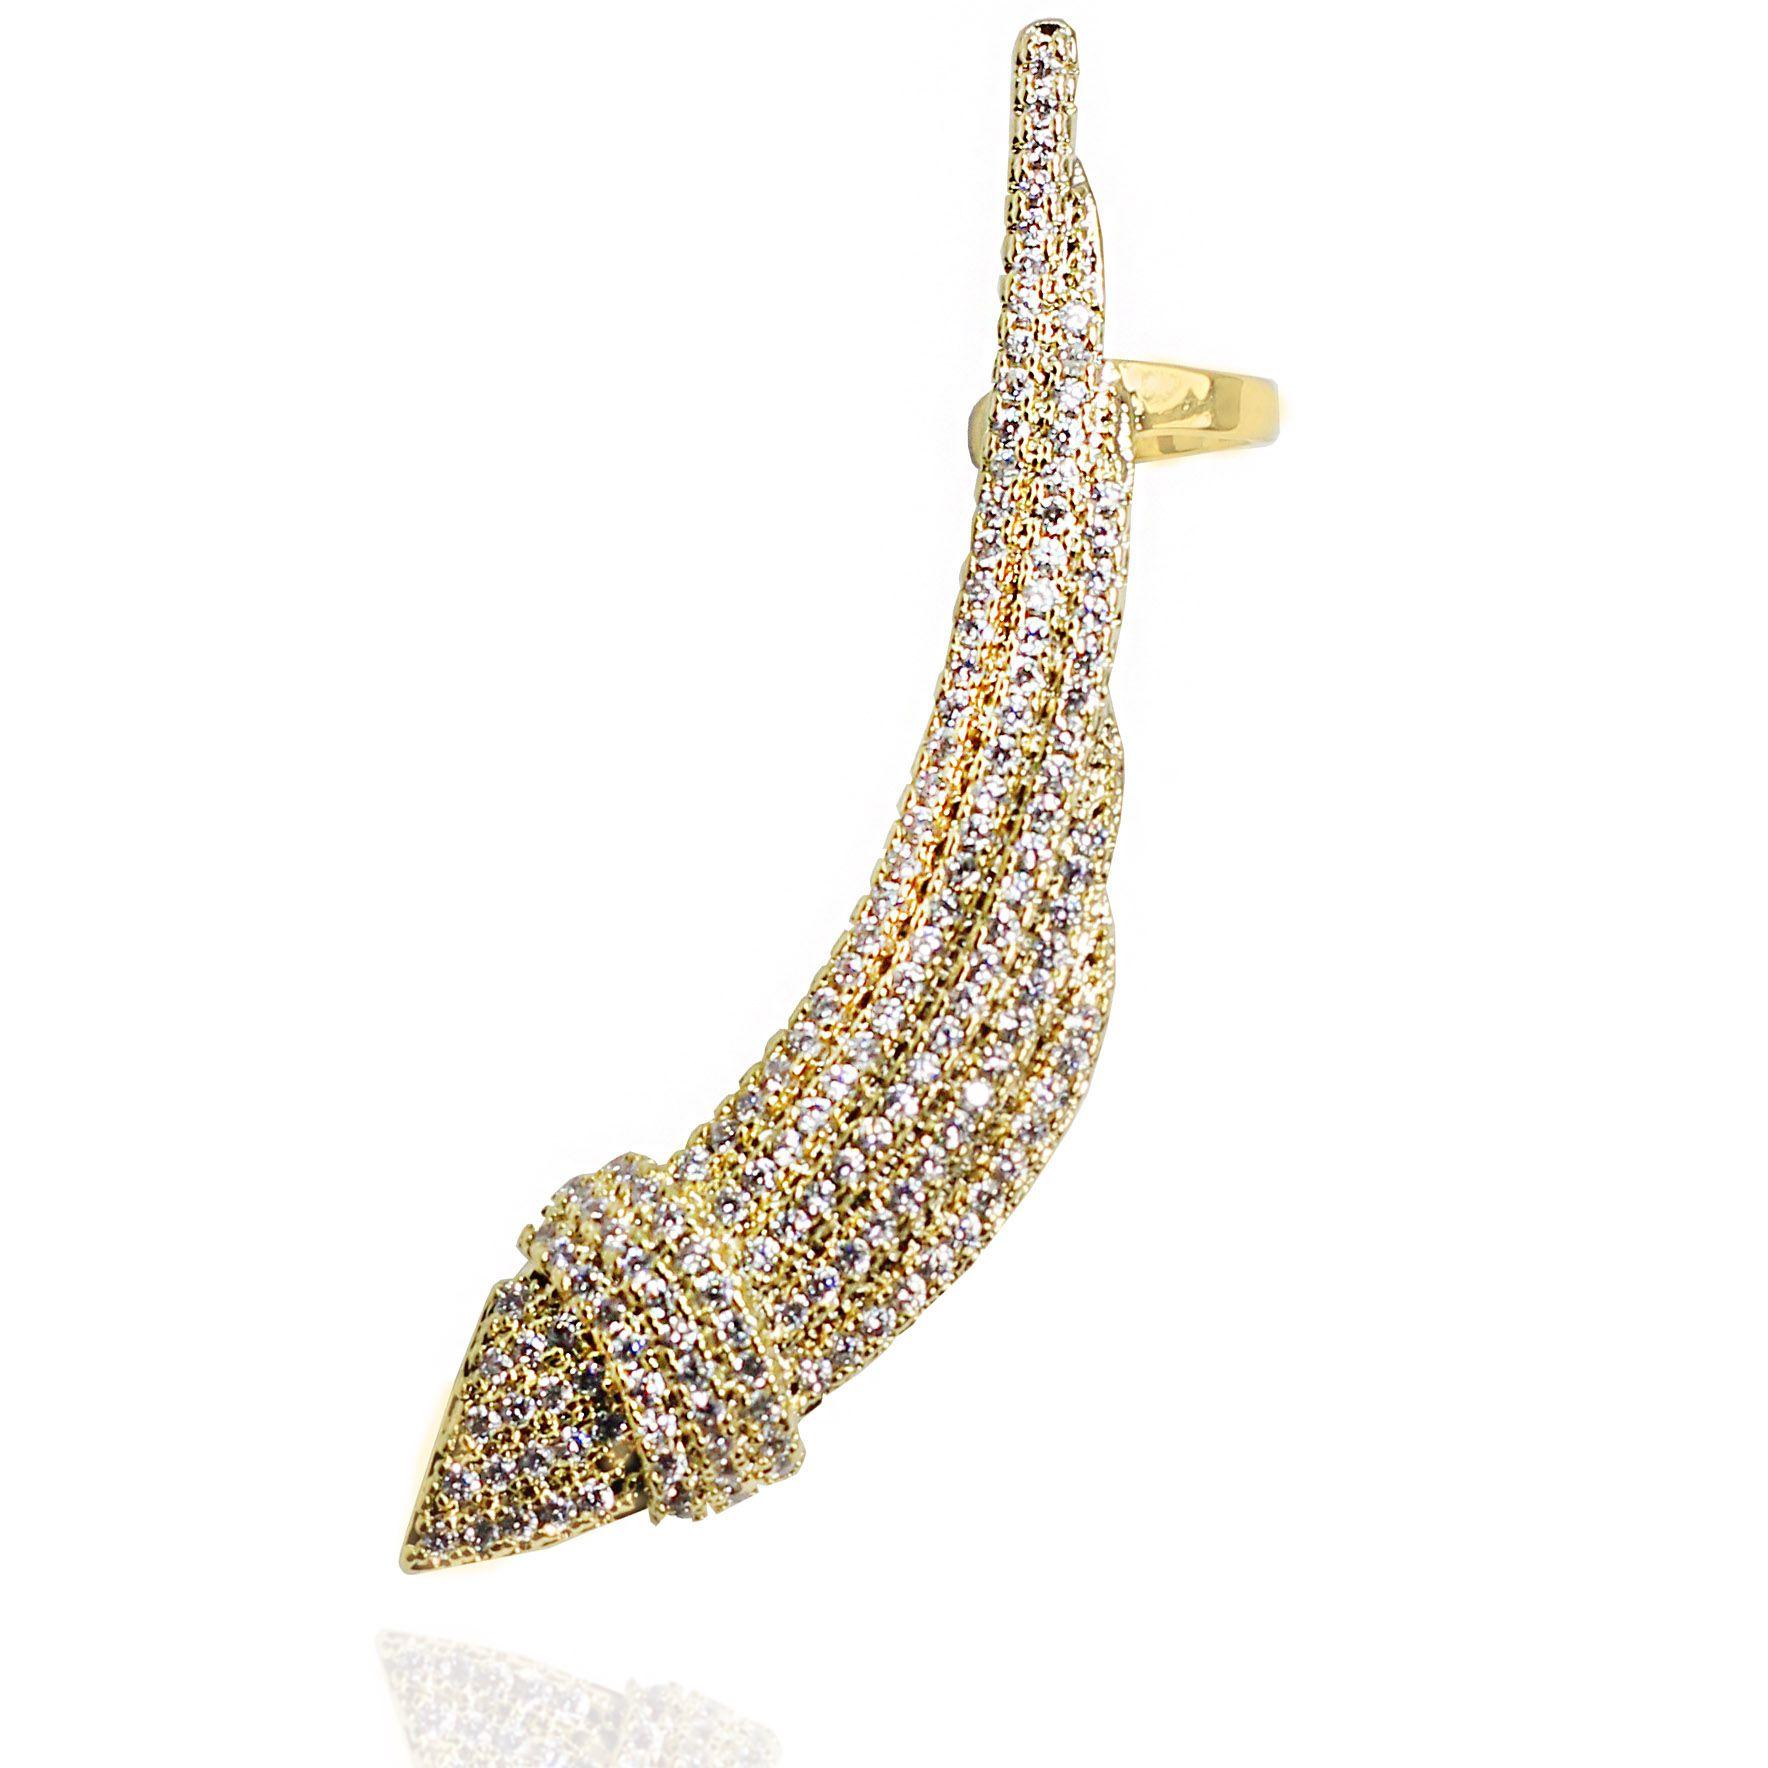 118c1db29d51d Brinco Ear Cuff Zircônia Cravejada Folheado Ouro 18K - Lunozê Joias